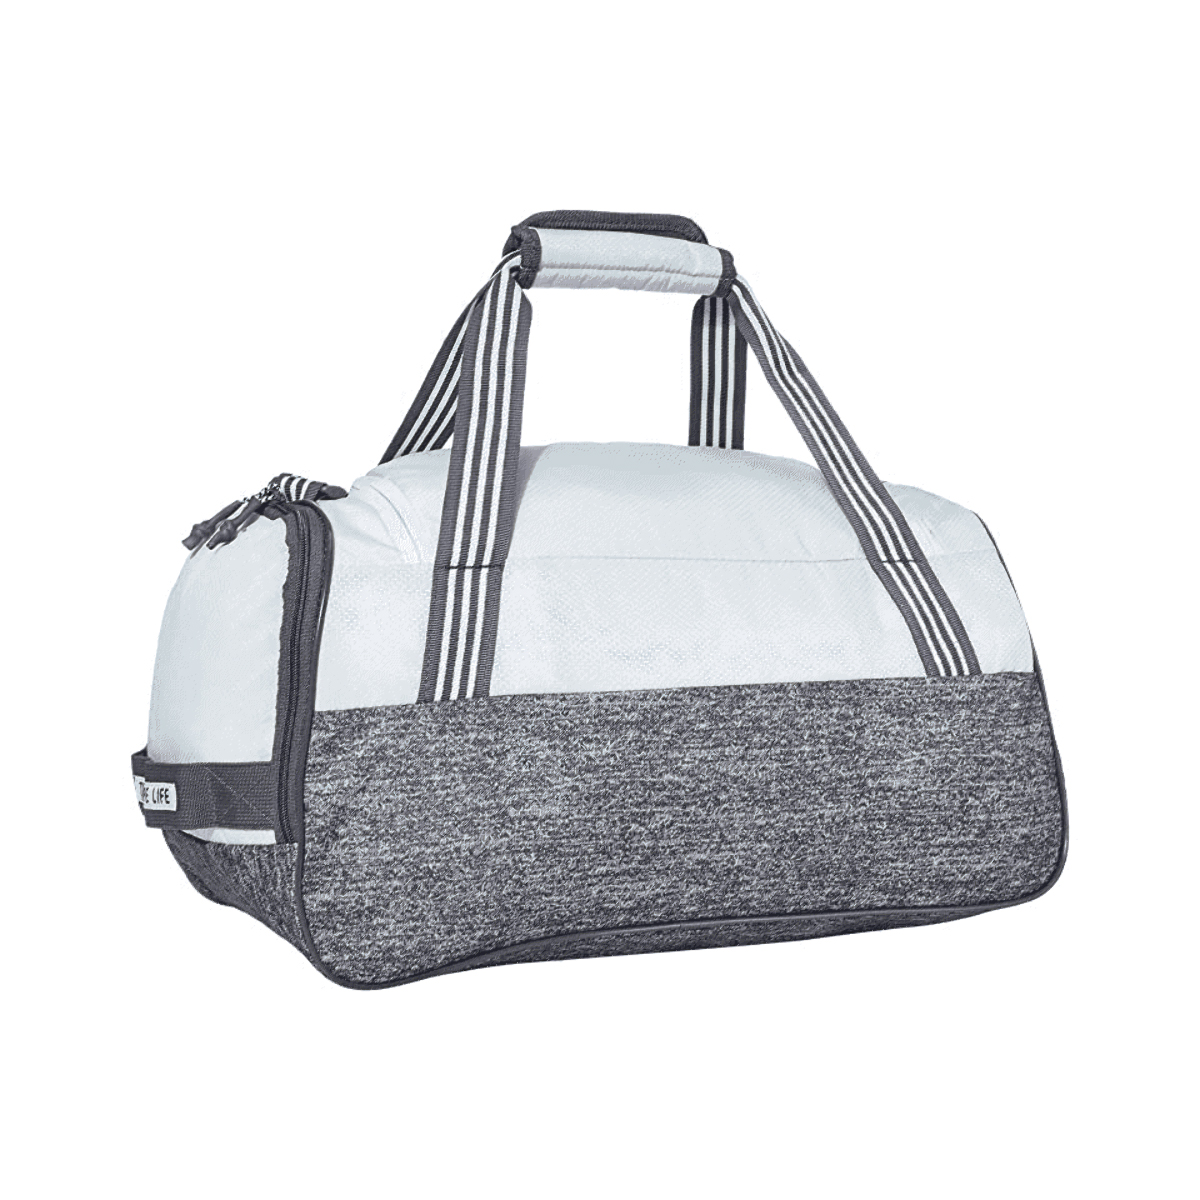 Adidas Squad LV Duffle Bag - Color: Sky Tint Blue/Jersey Onix - Size: One Size, Sky Tint Blue/Jersey Onix, large, image 2